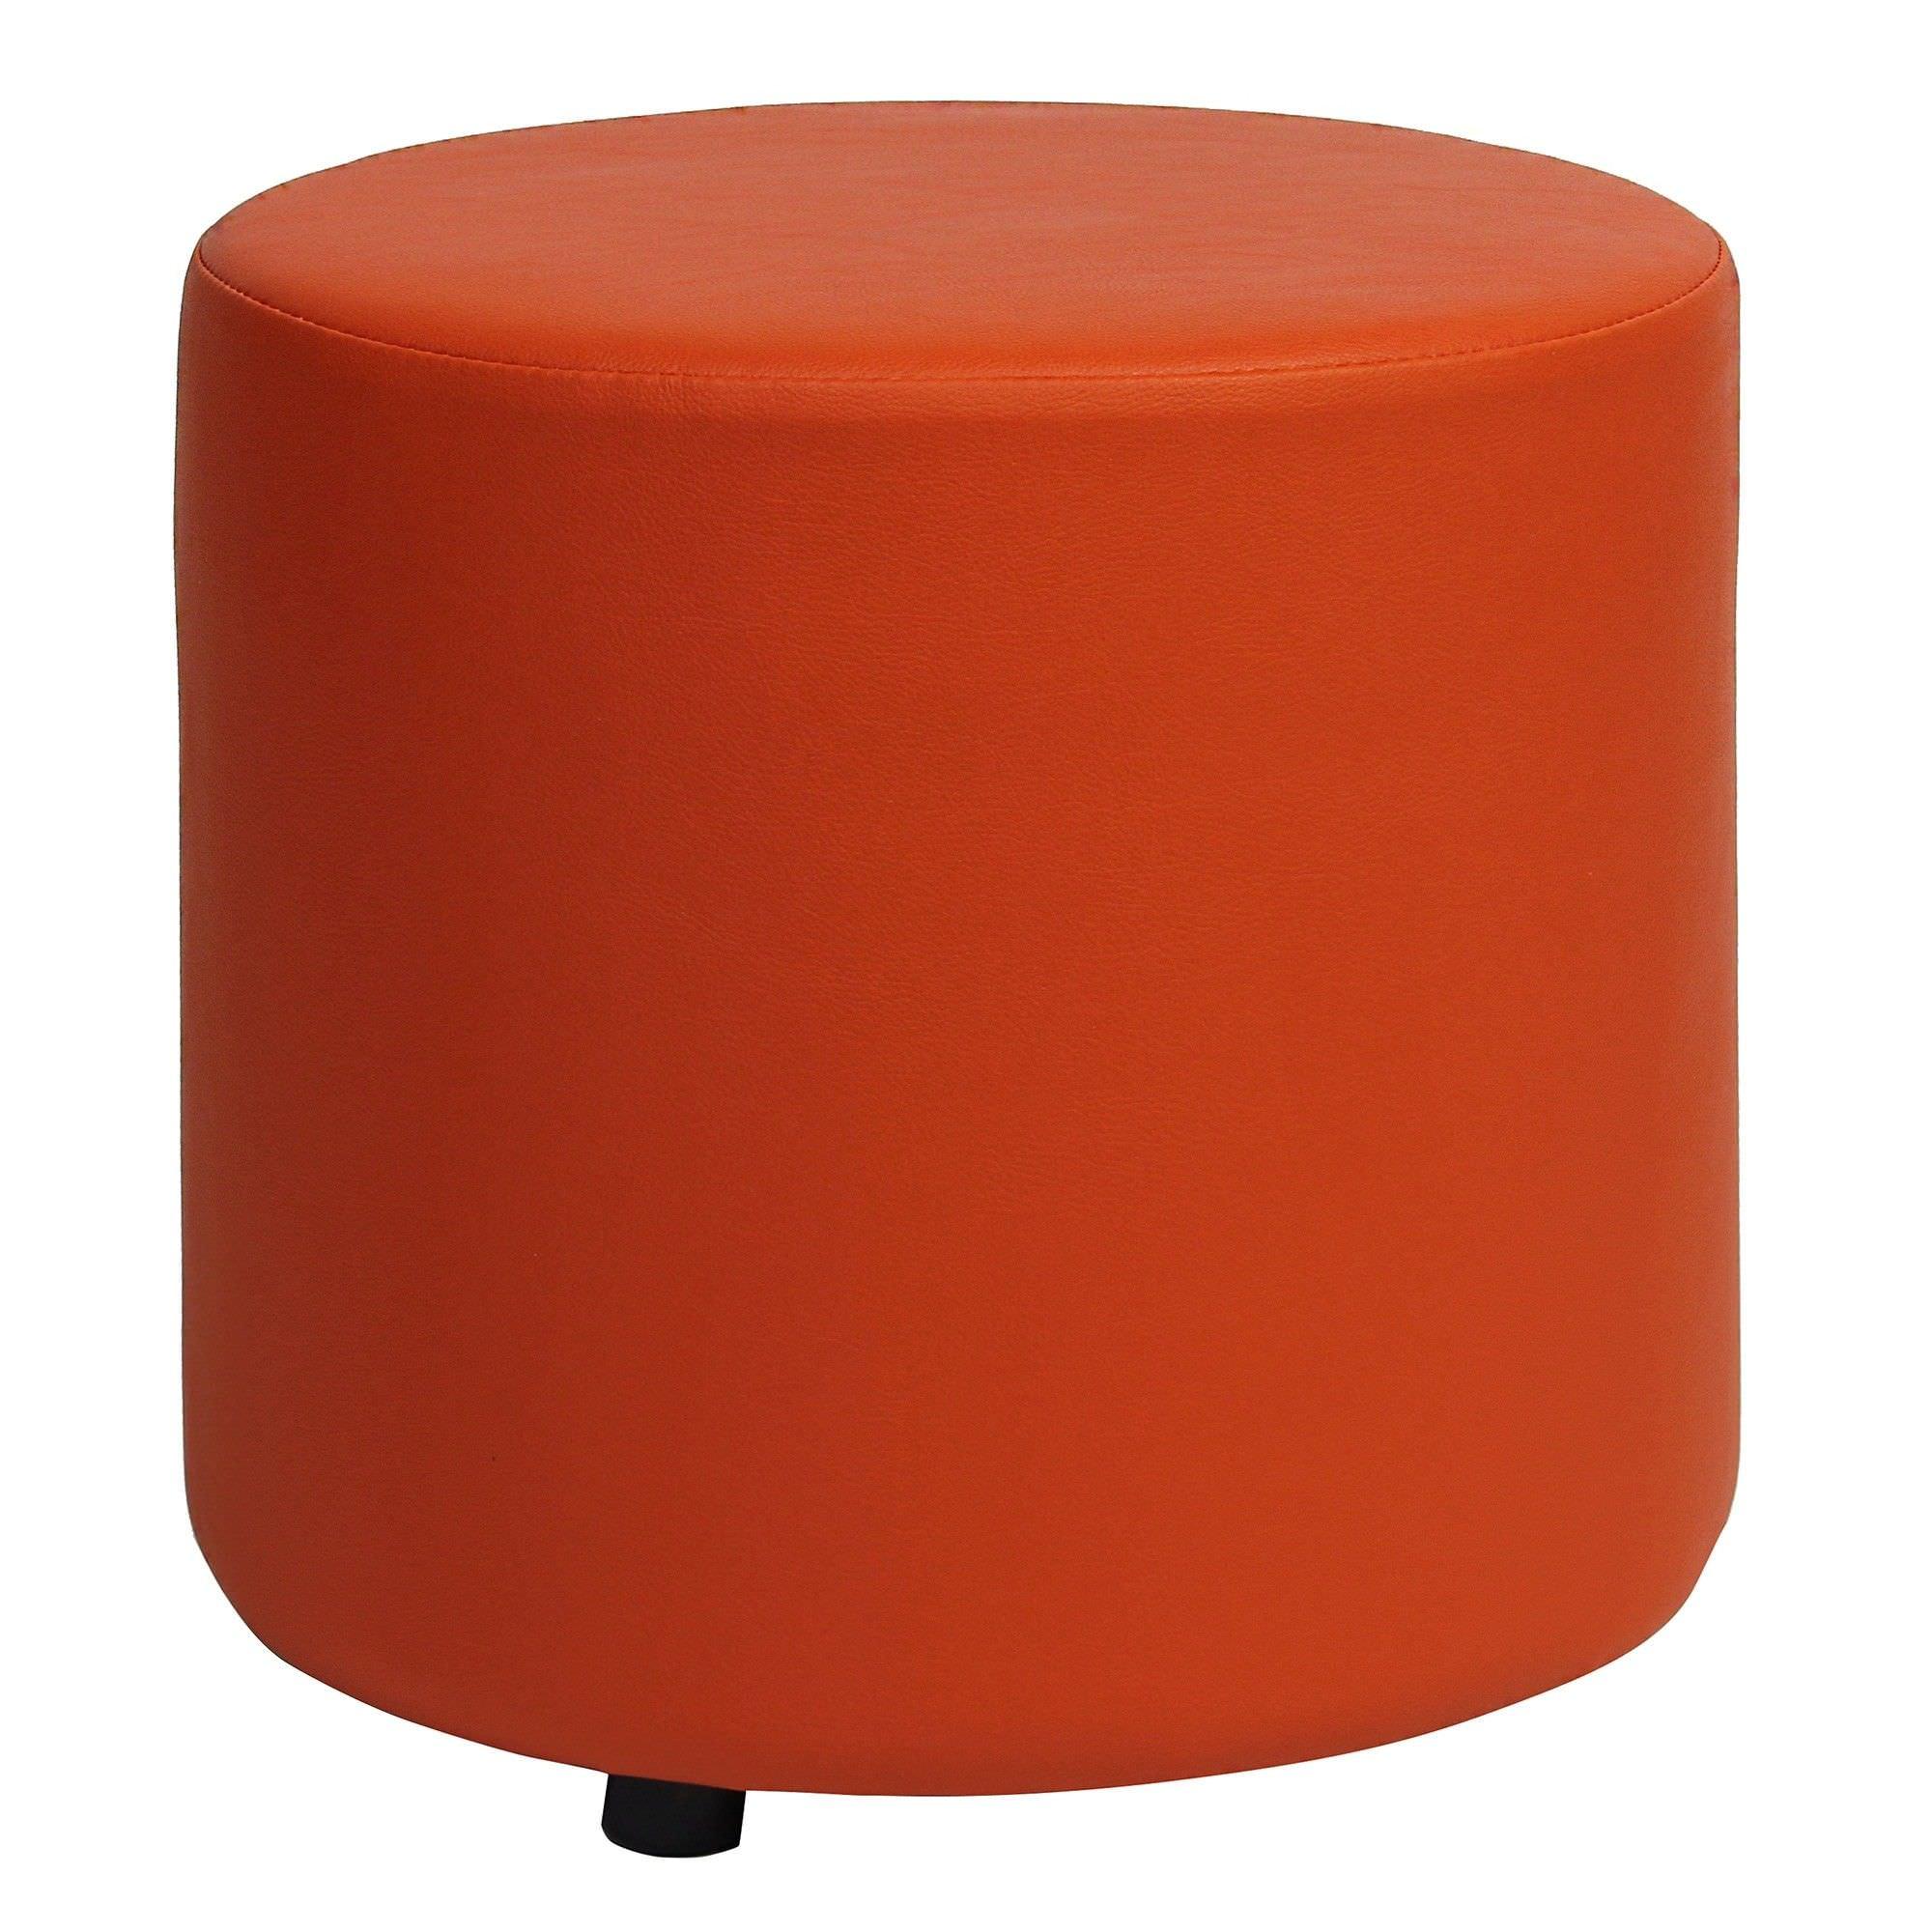 Blob V2 Commercial Grade Vinyl Round Ottoman - Orange